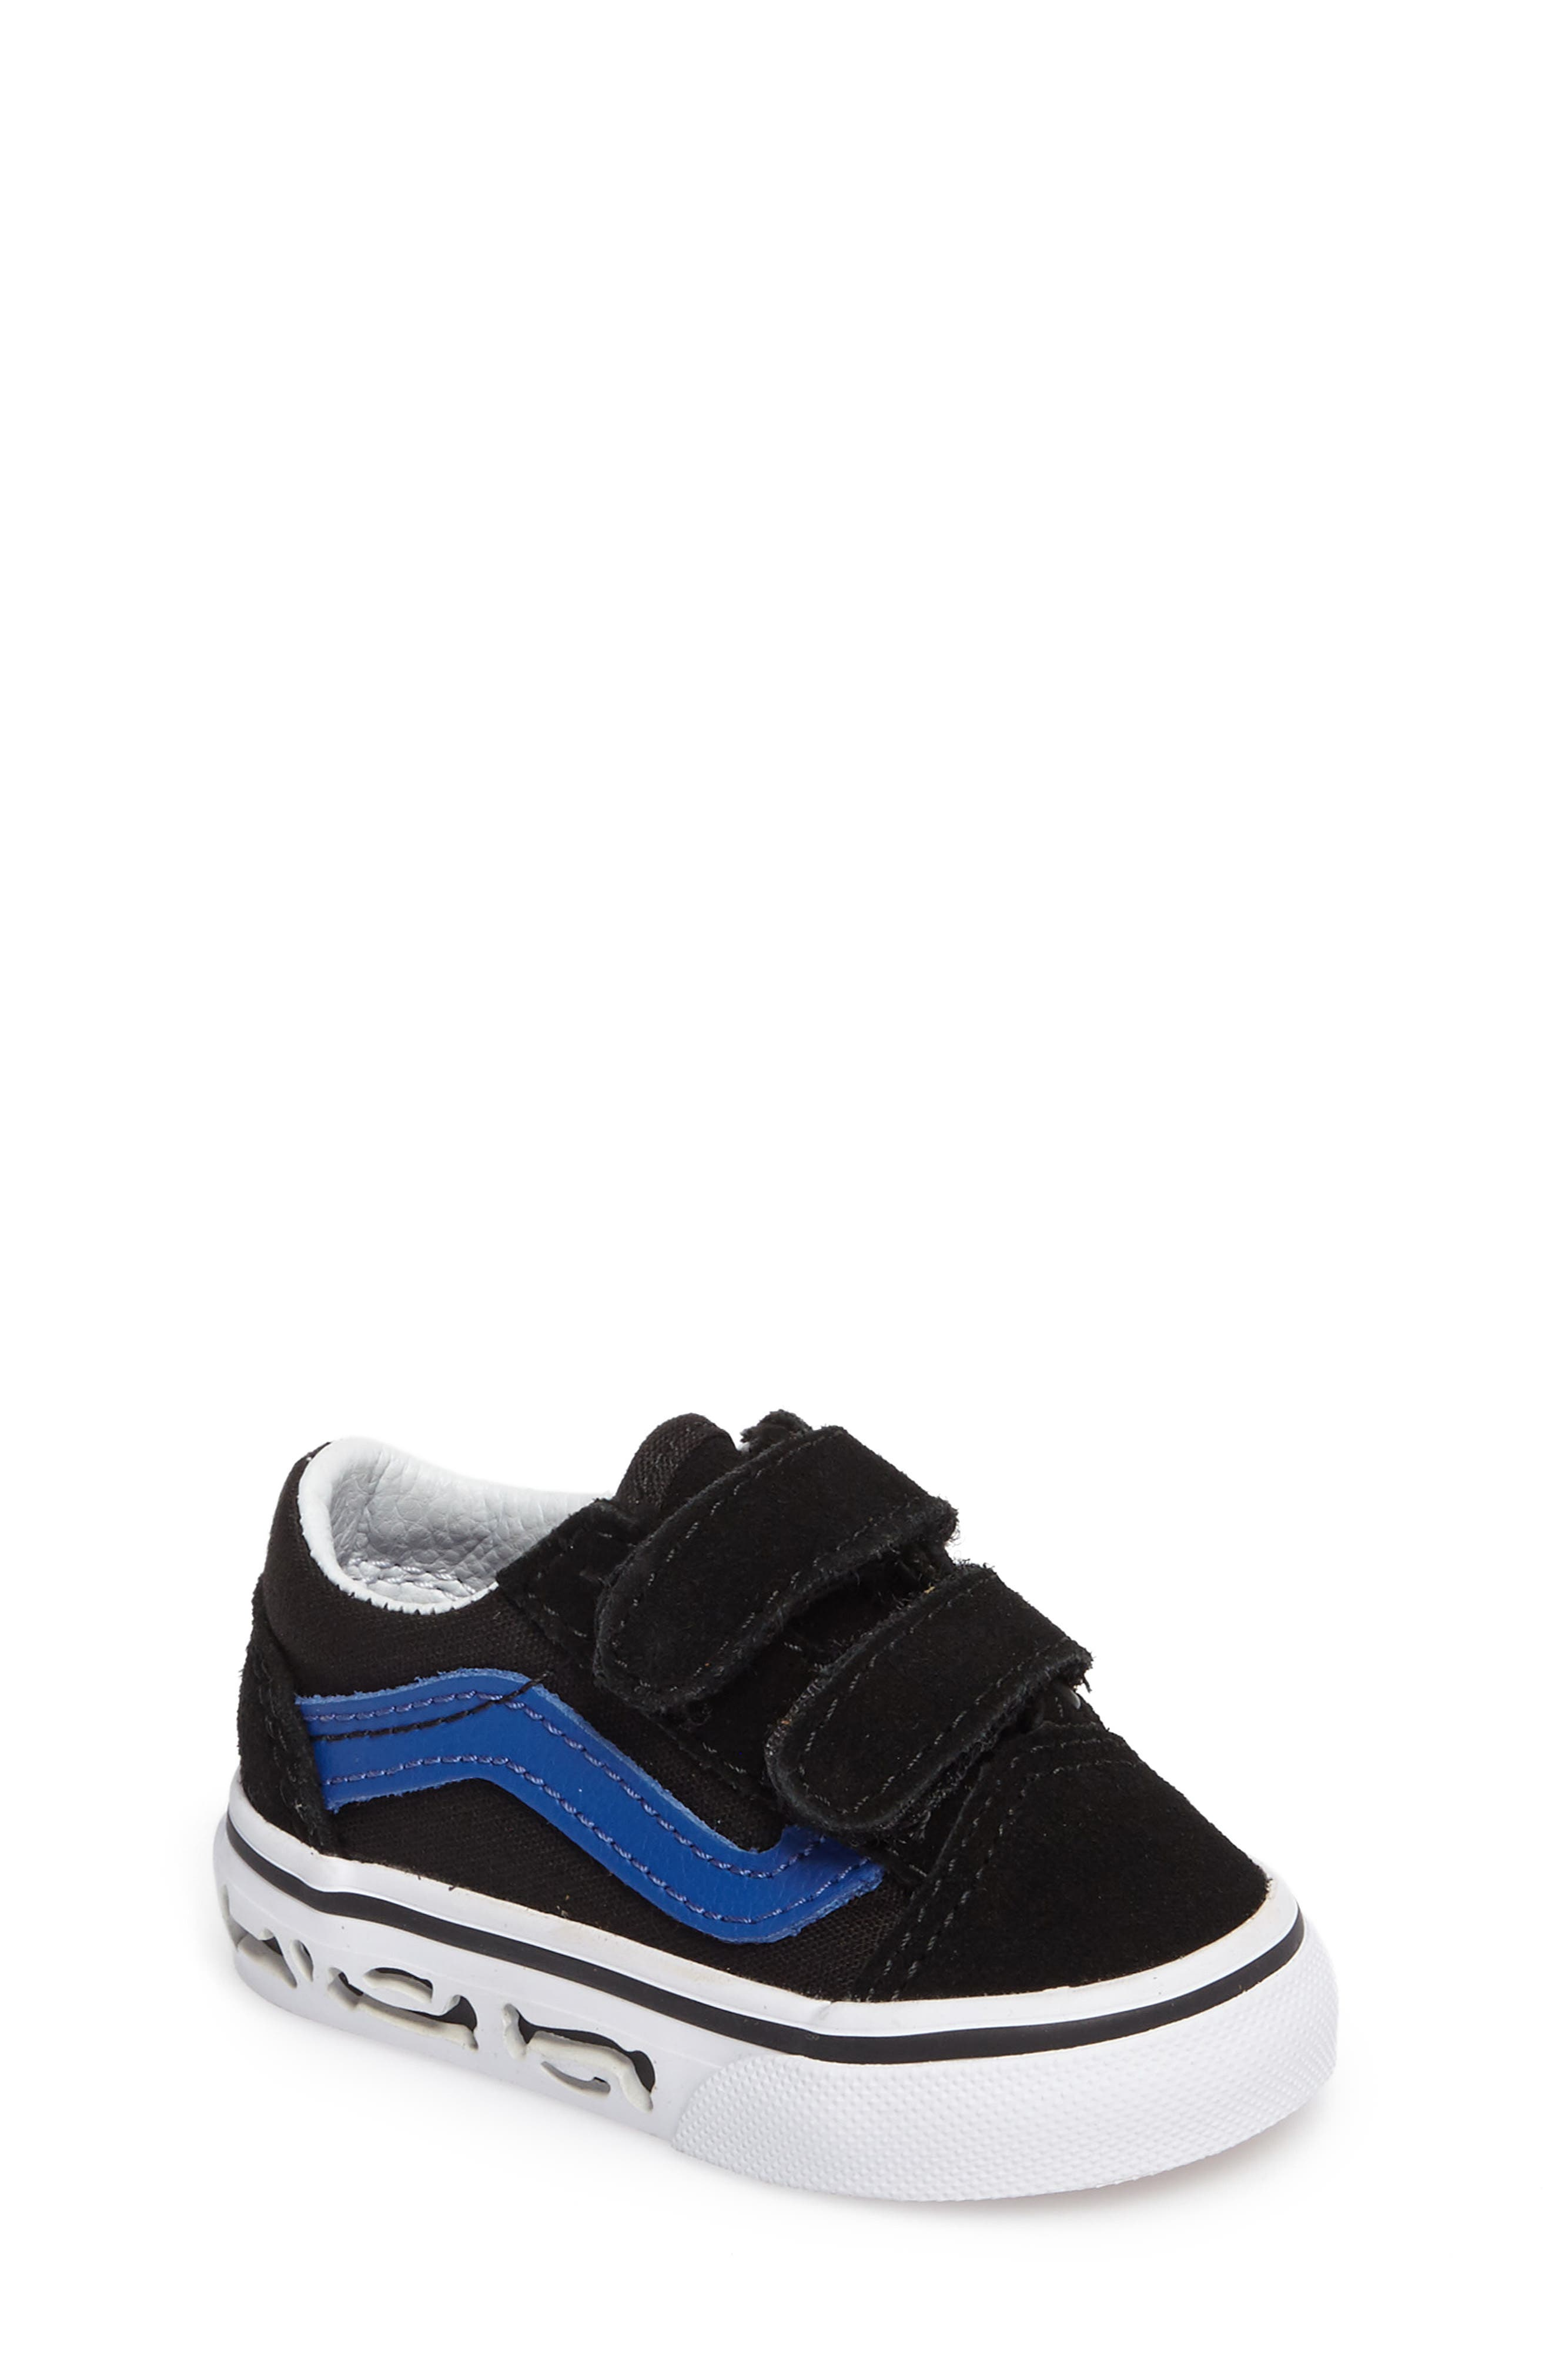 Vans Old Skool V Sneaker (Baby, Walker & Toddler)